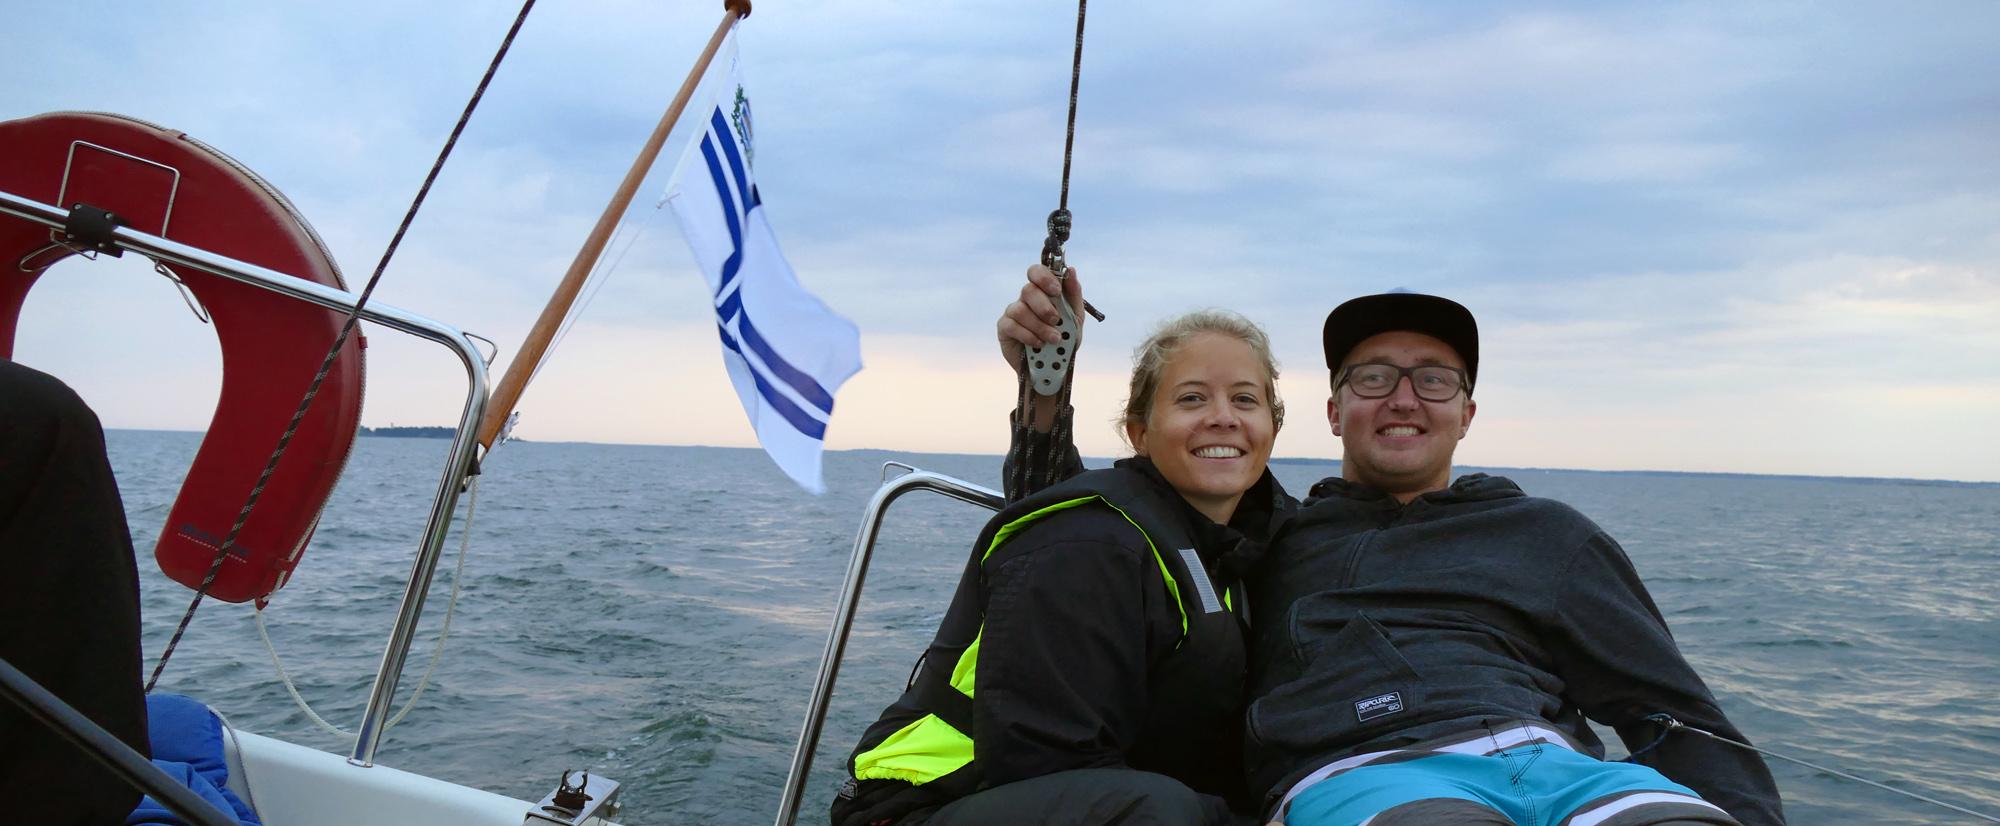 segling1